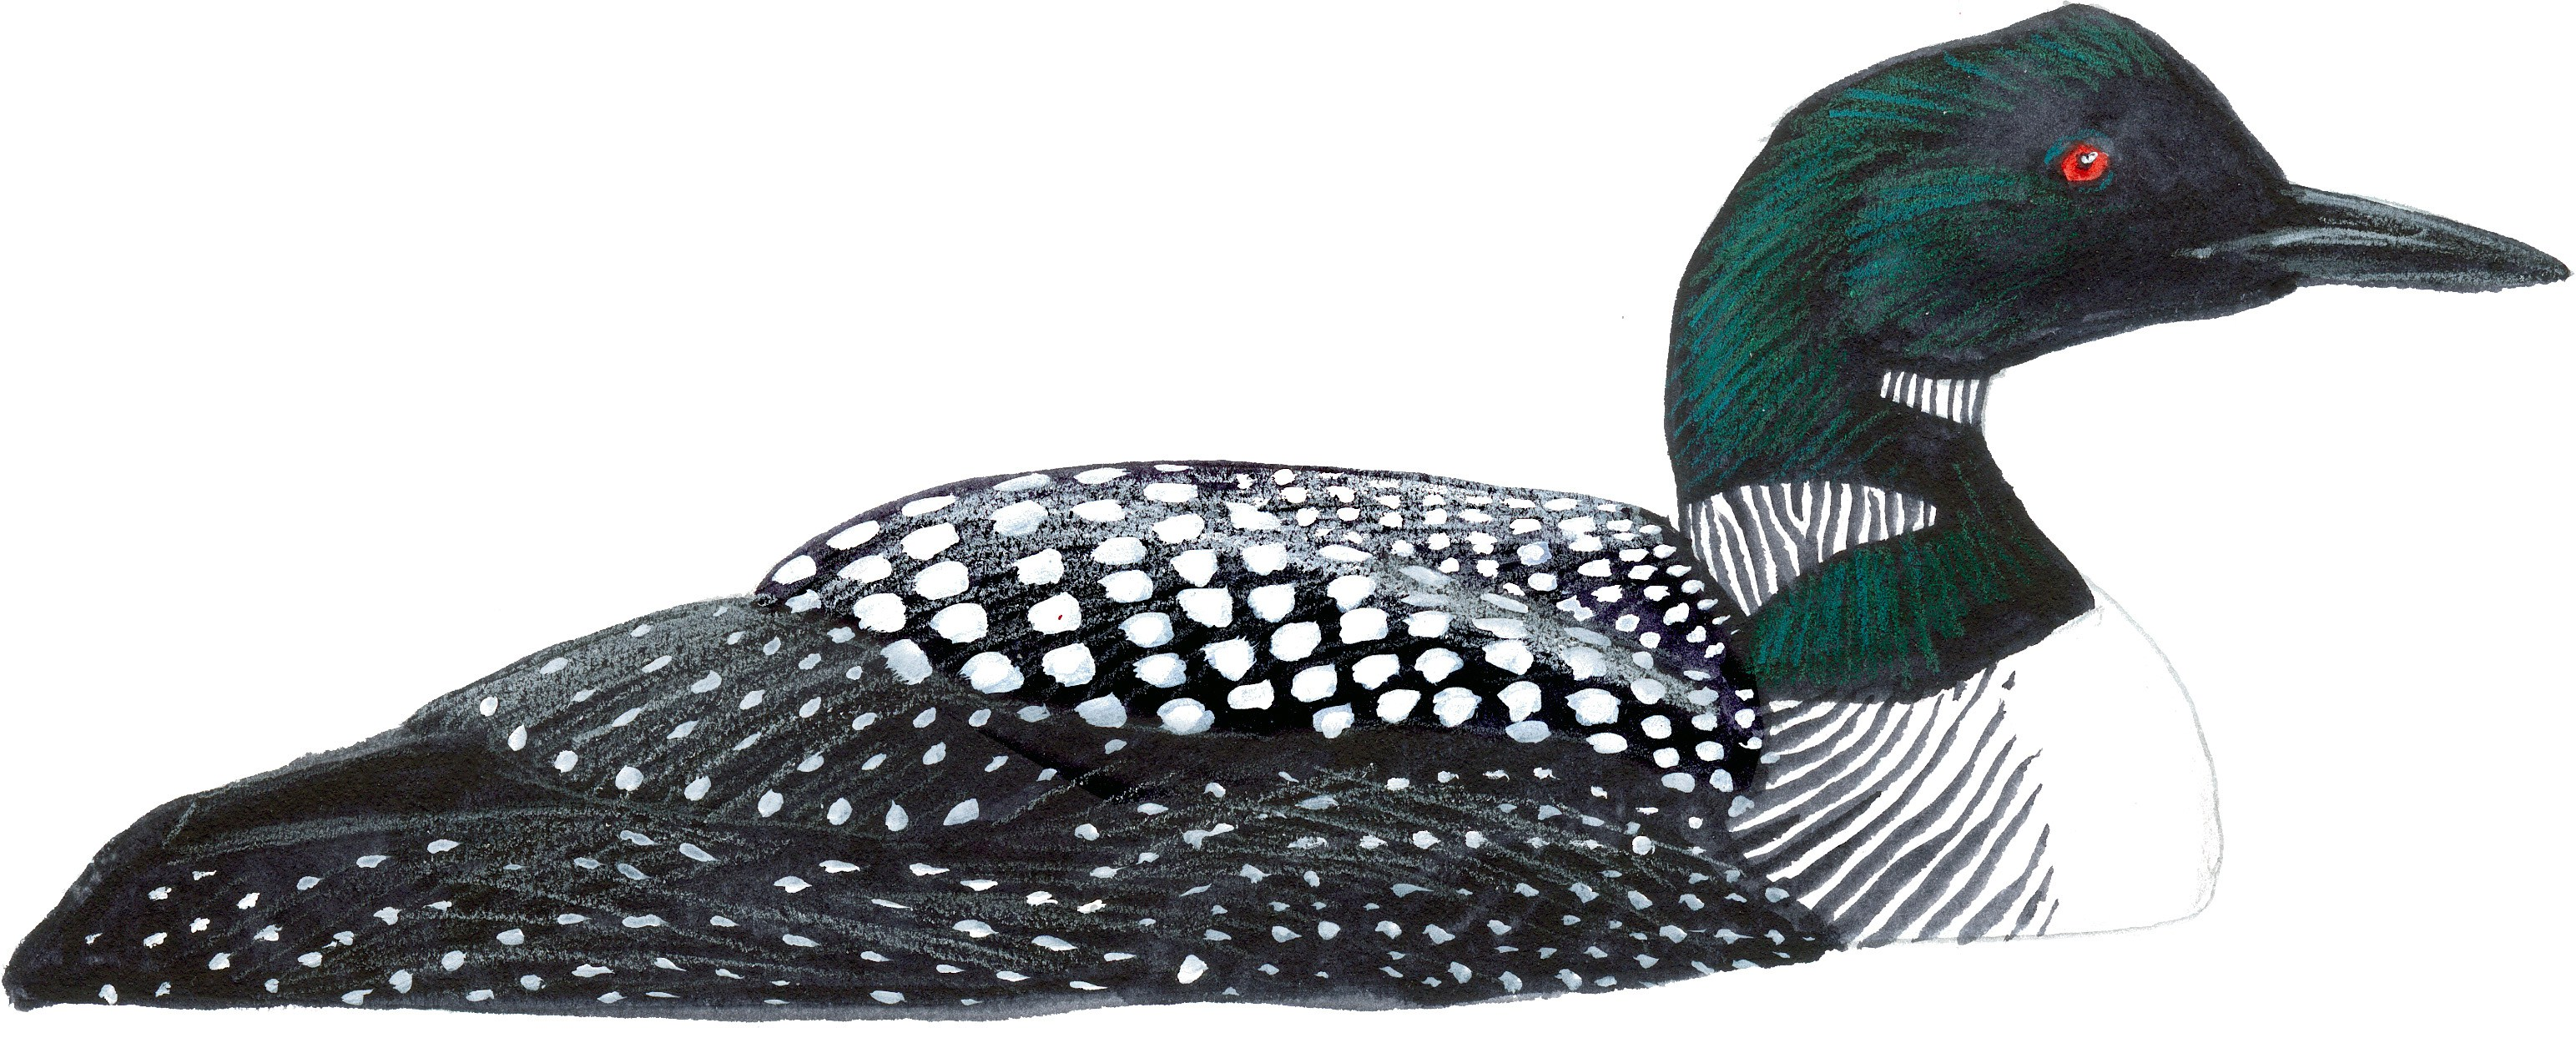 Common john muir laws. Bird clipart loon